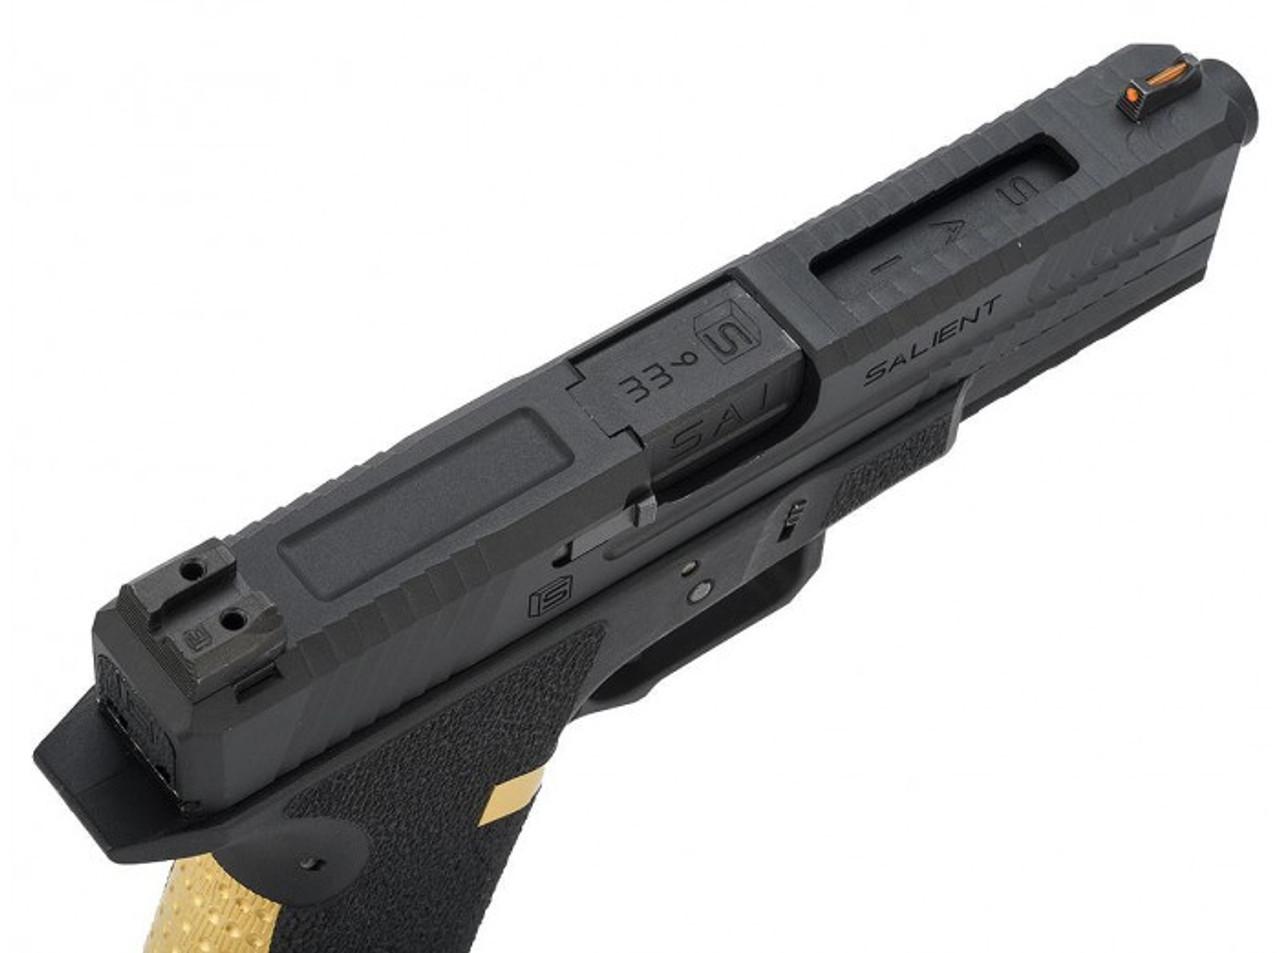 EMG Salient Arms International BLU GBB Pistol - Black